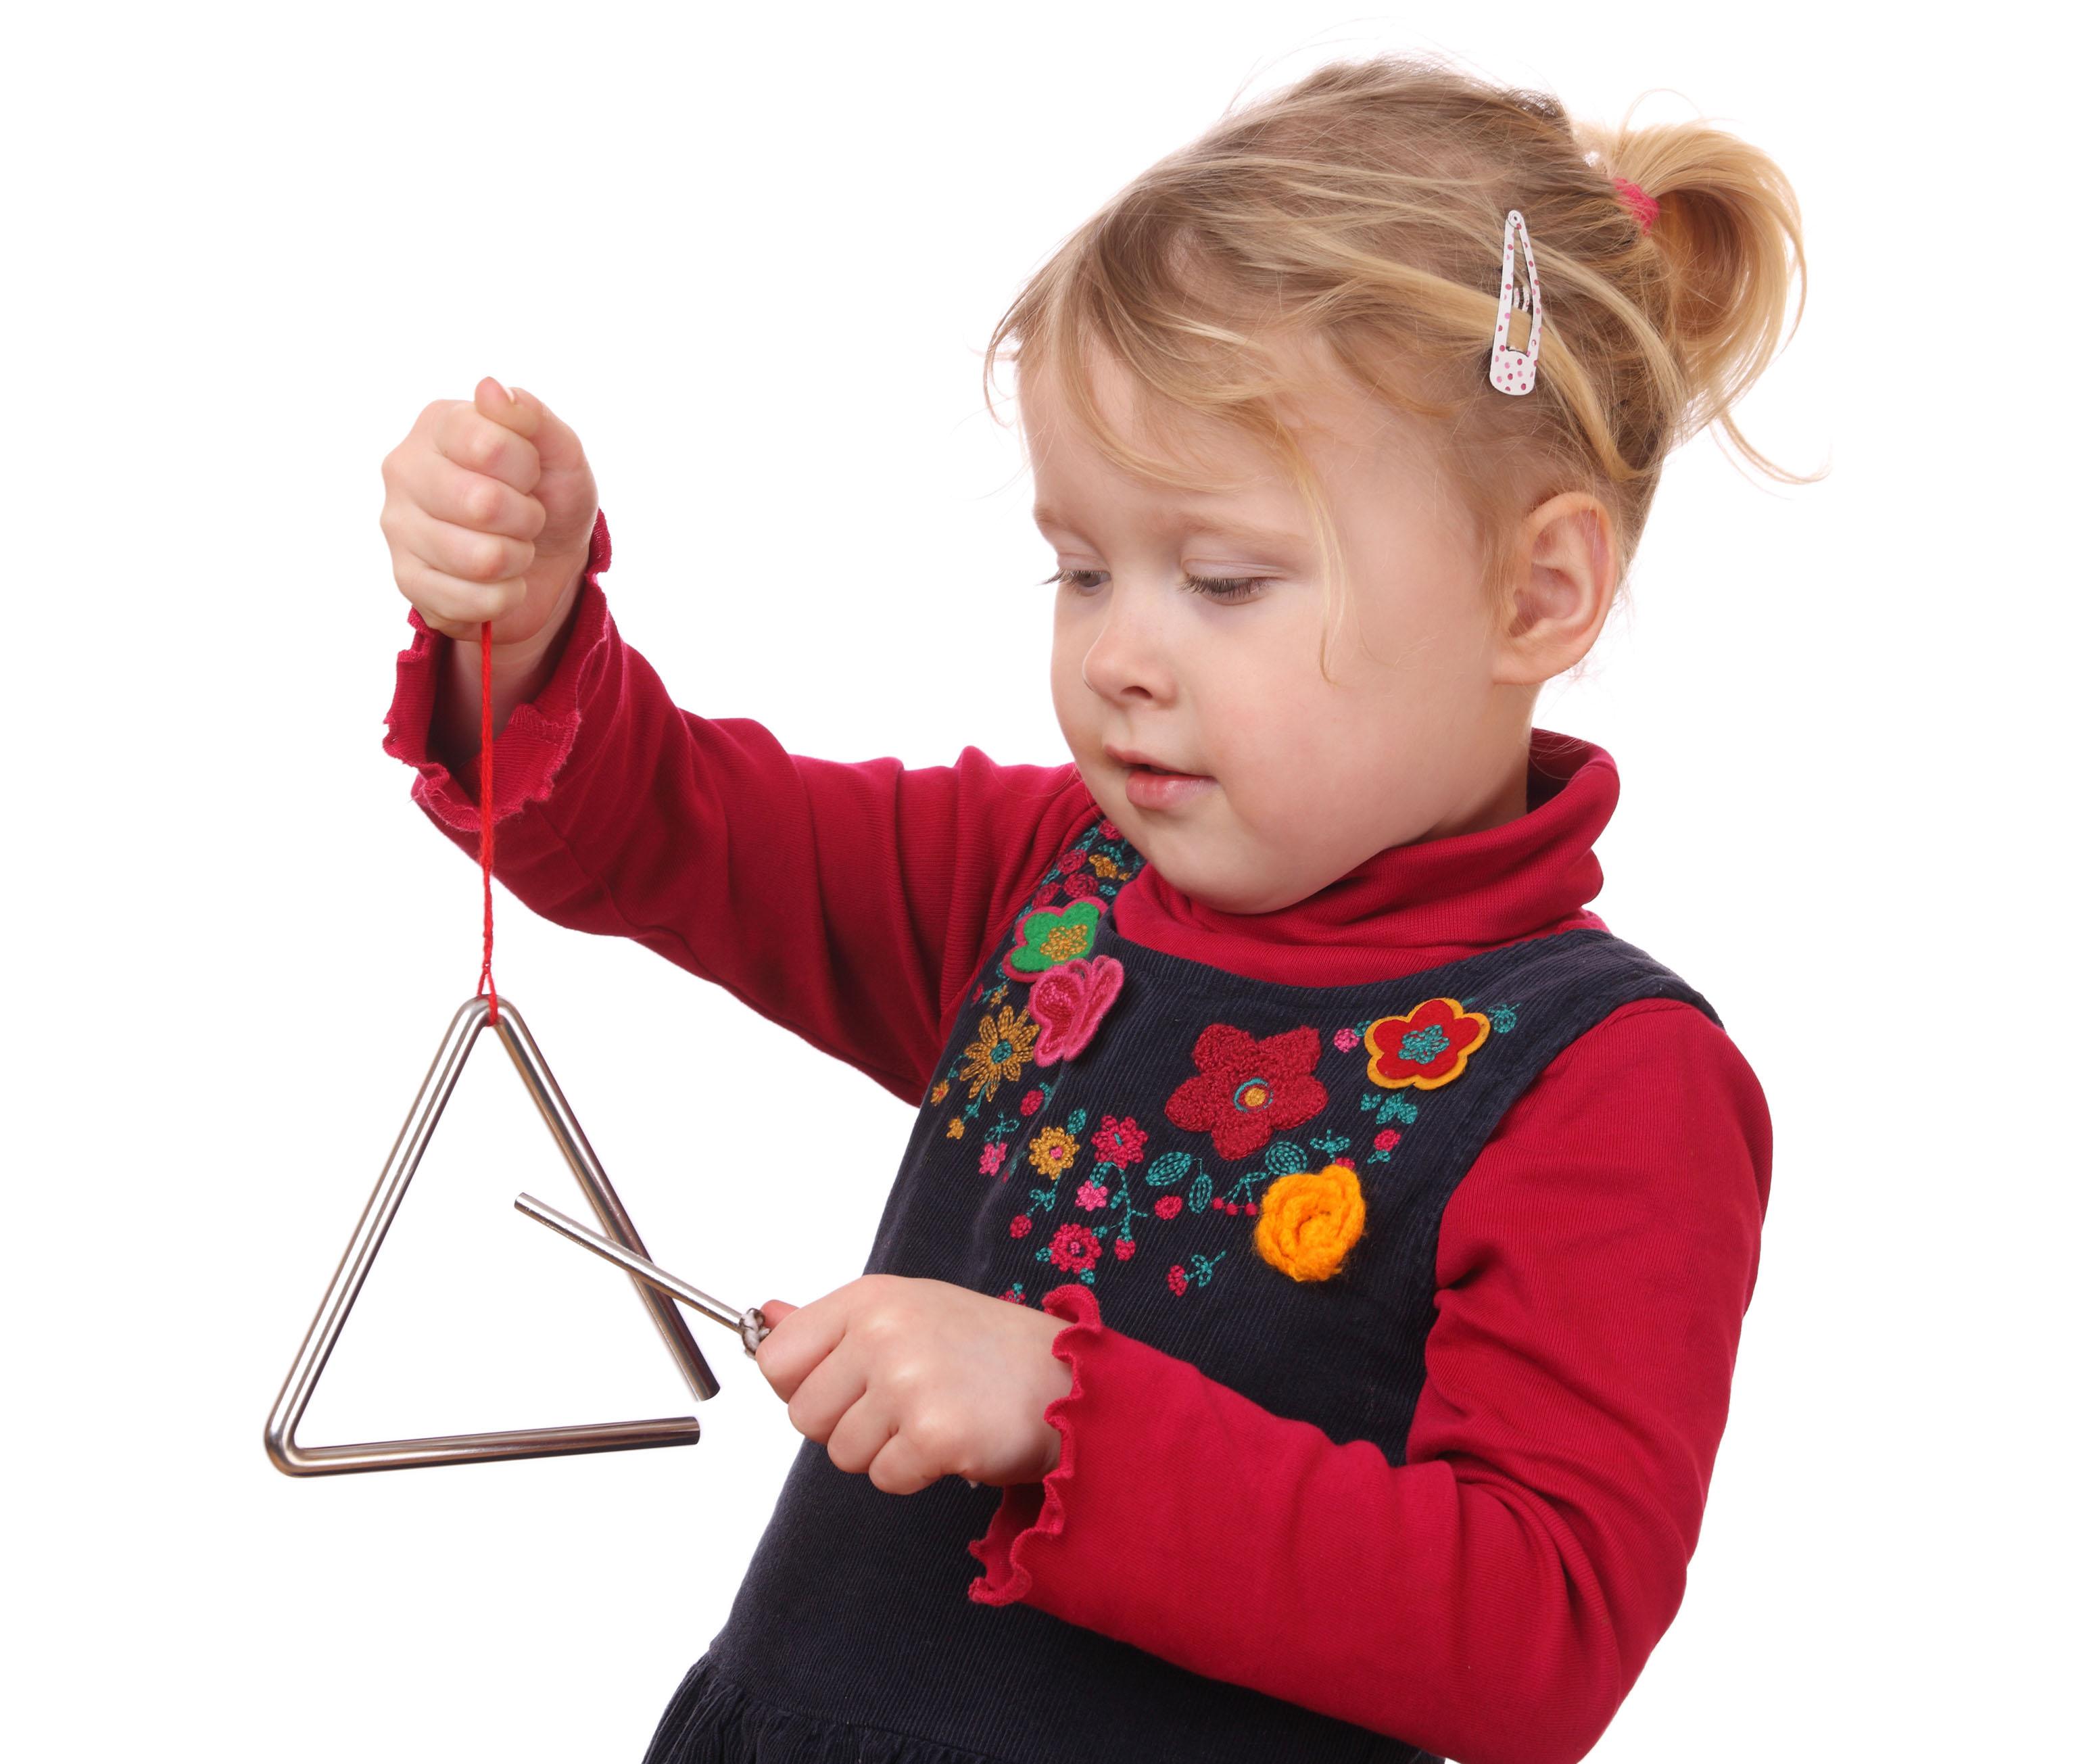 Menina tocando o instrumento triângulo1-editado